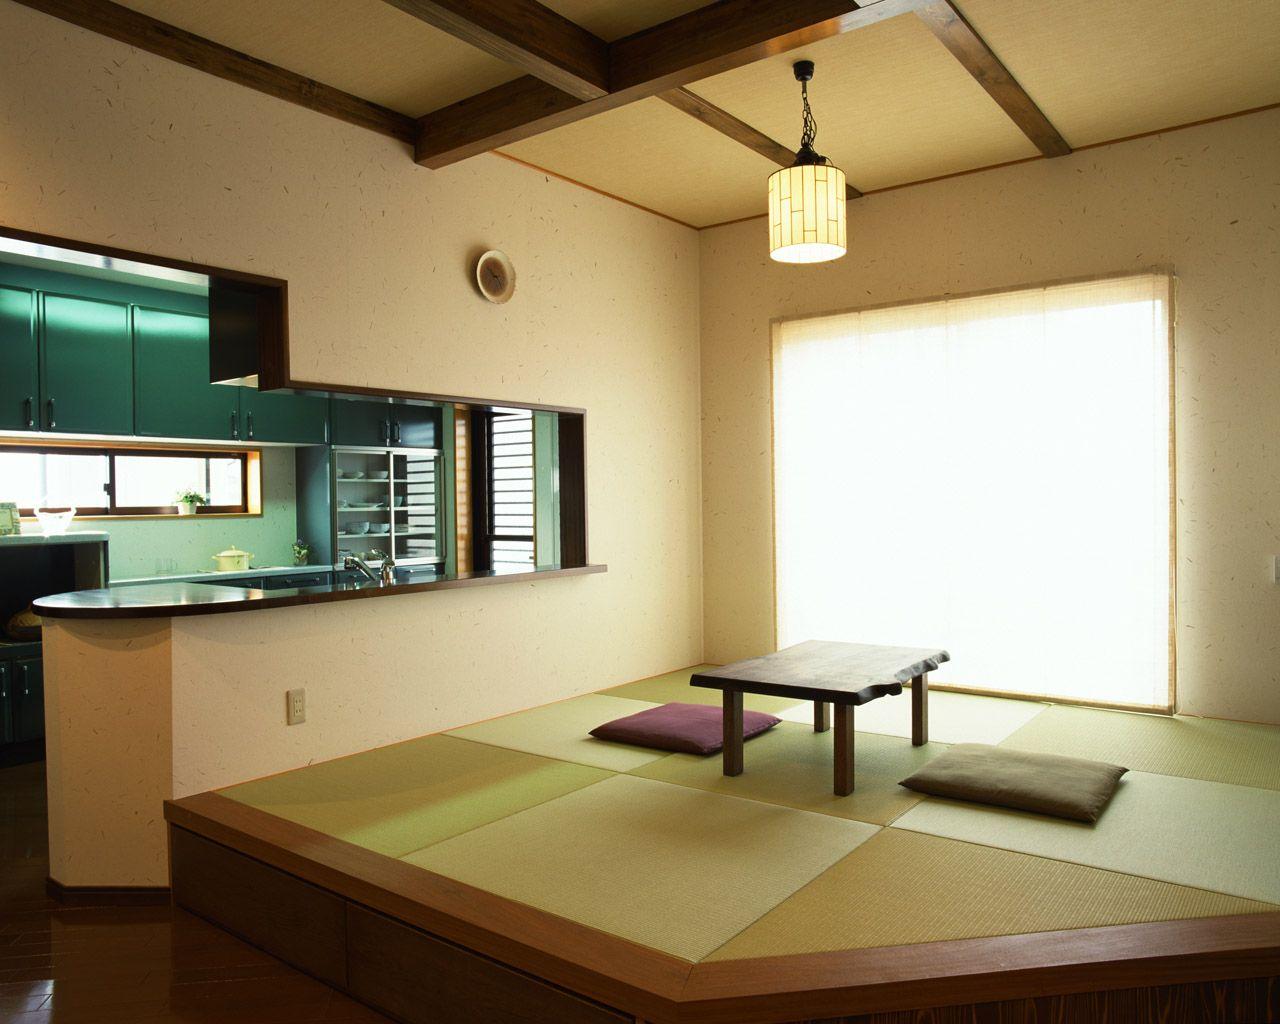 Korean interior design 3d hd wallpapers Home Decorum and Ideas